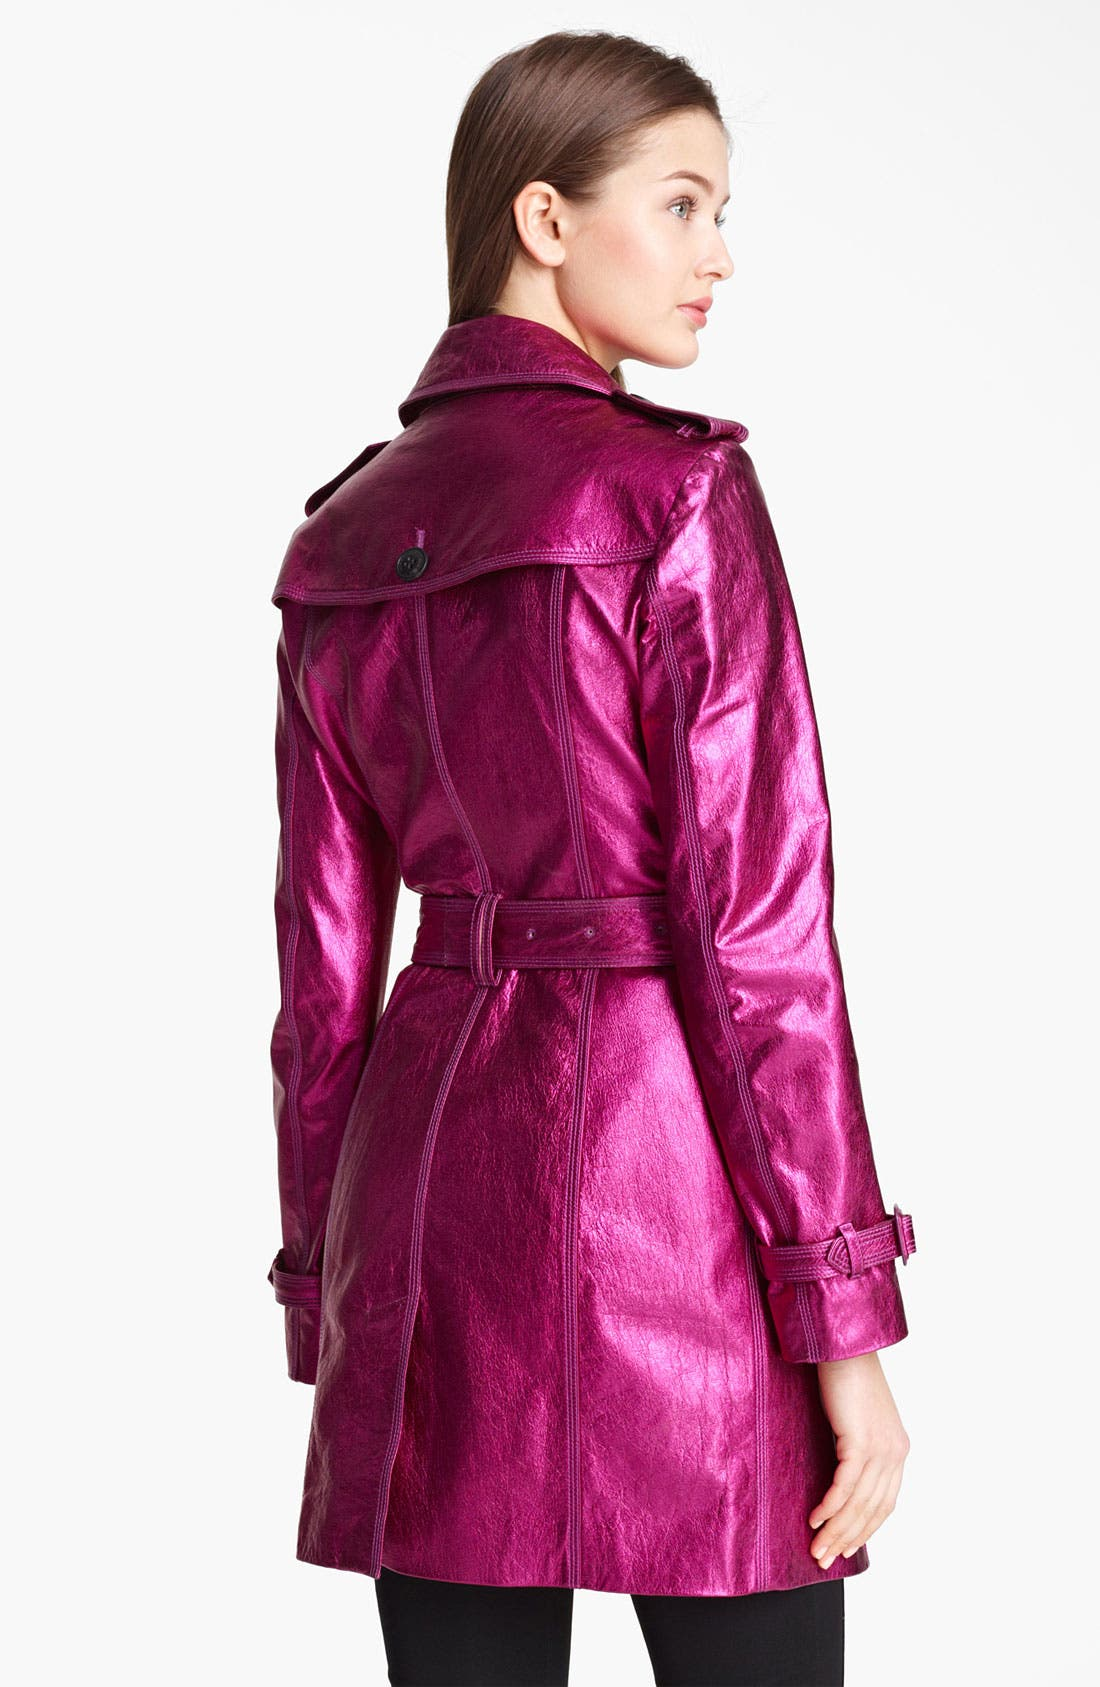 London Metallic Leather Trench Coat,                             Alternate thumbnail 2, color,                             Fuchsia